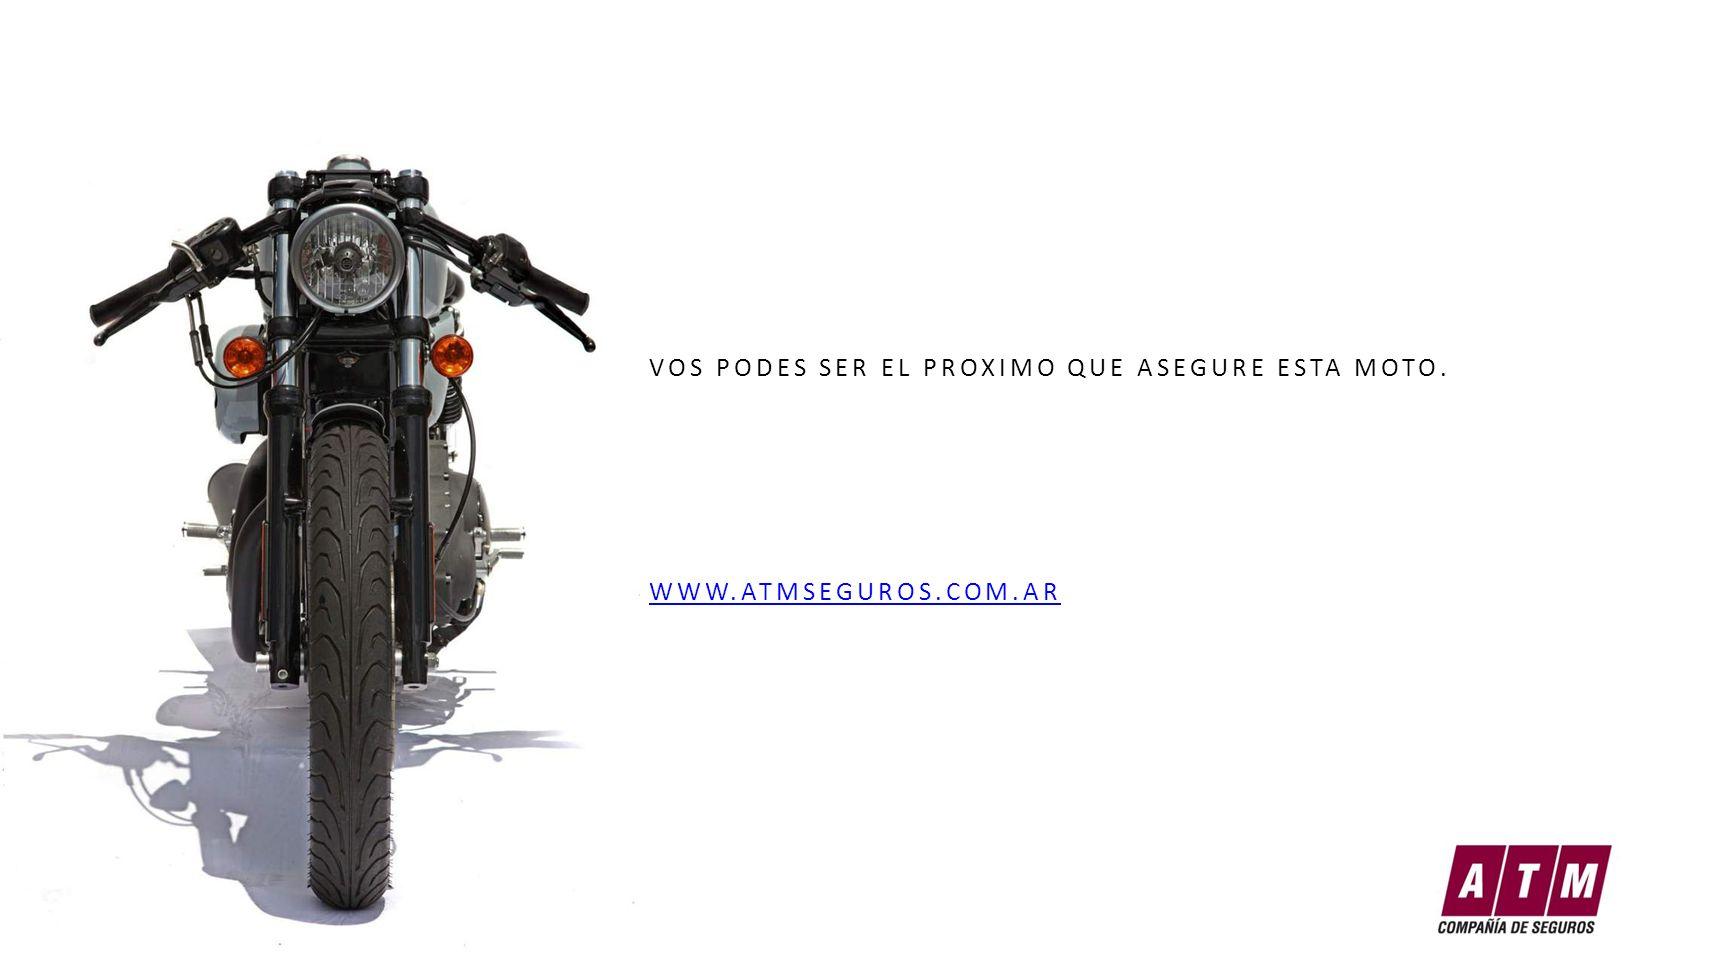 VOS PODES SER EL PROXIMO QUE ASEGURE ESTA MOTO. WWW.ATMSEGUROS.COM.AR